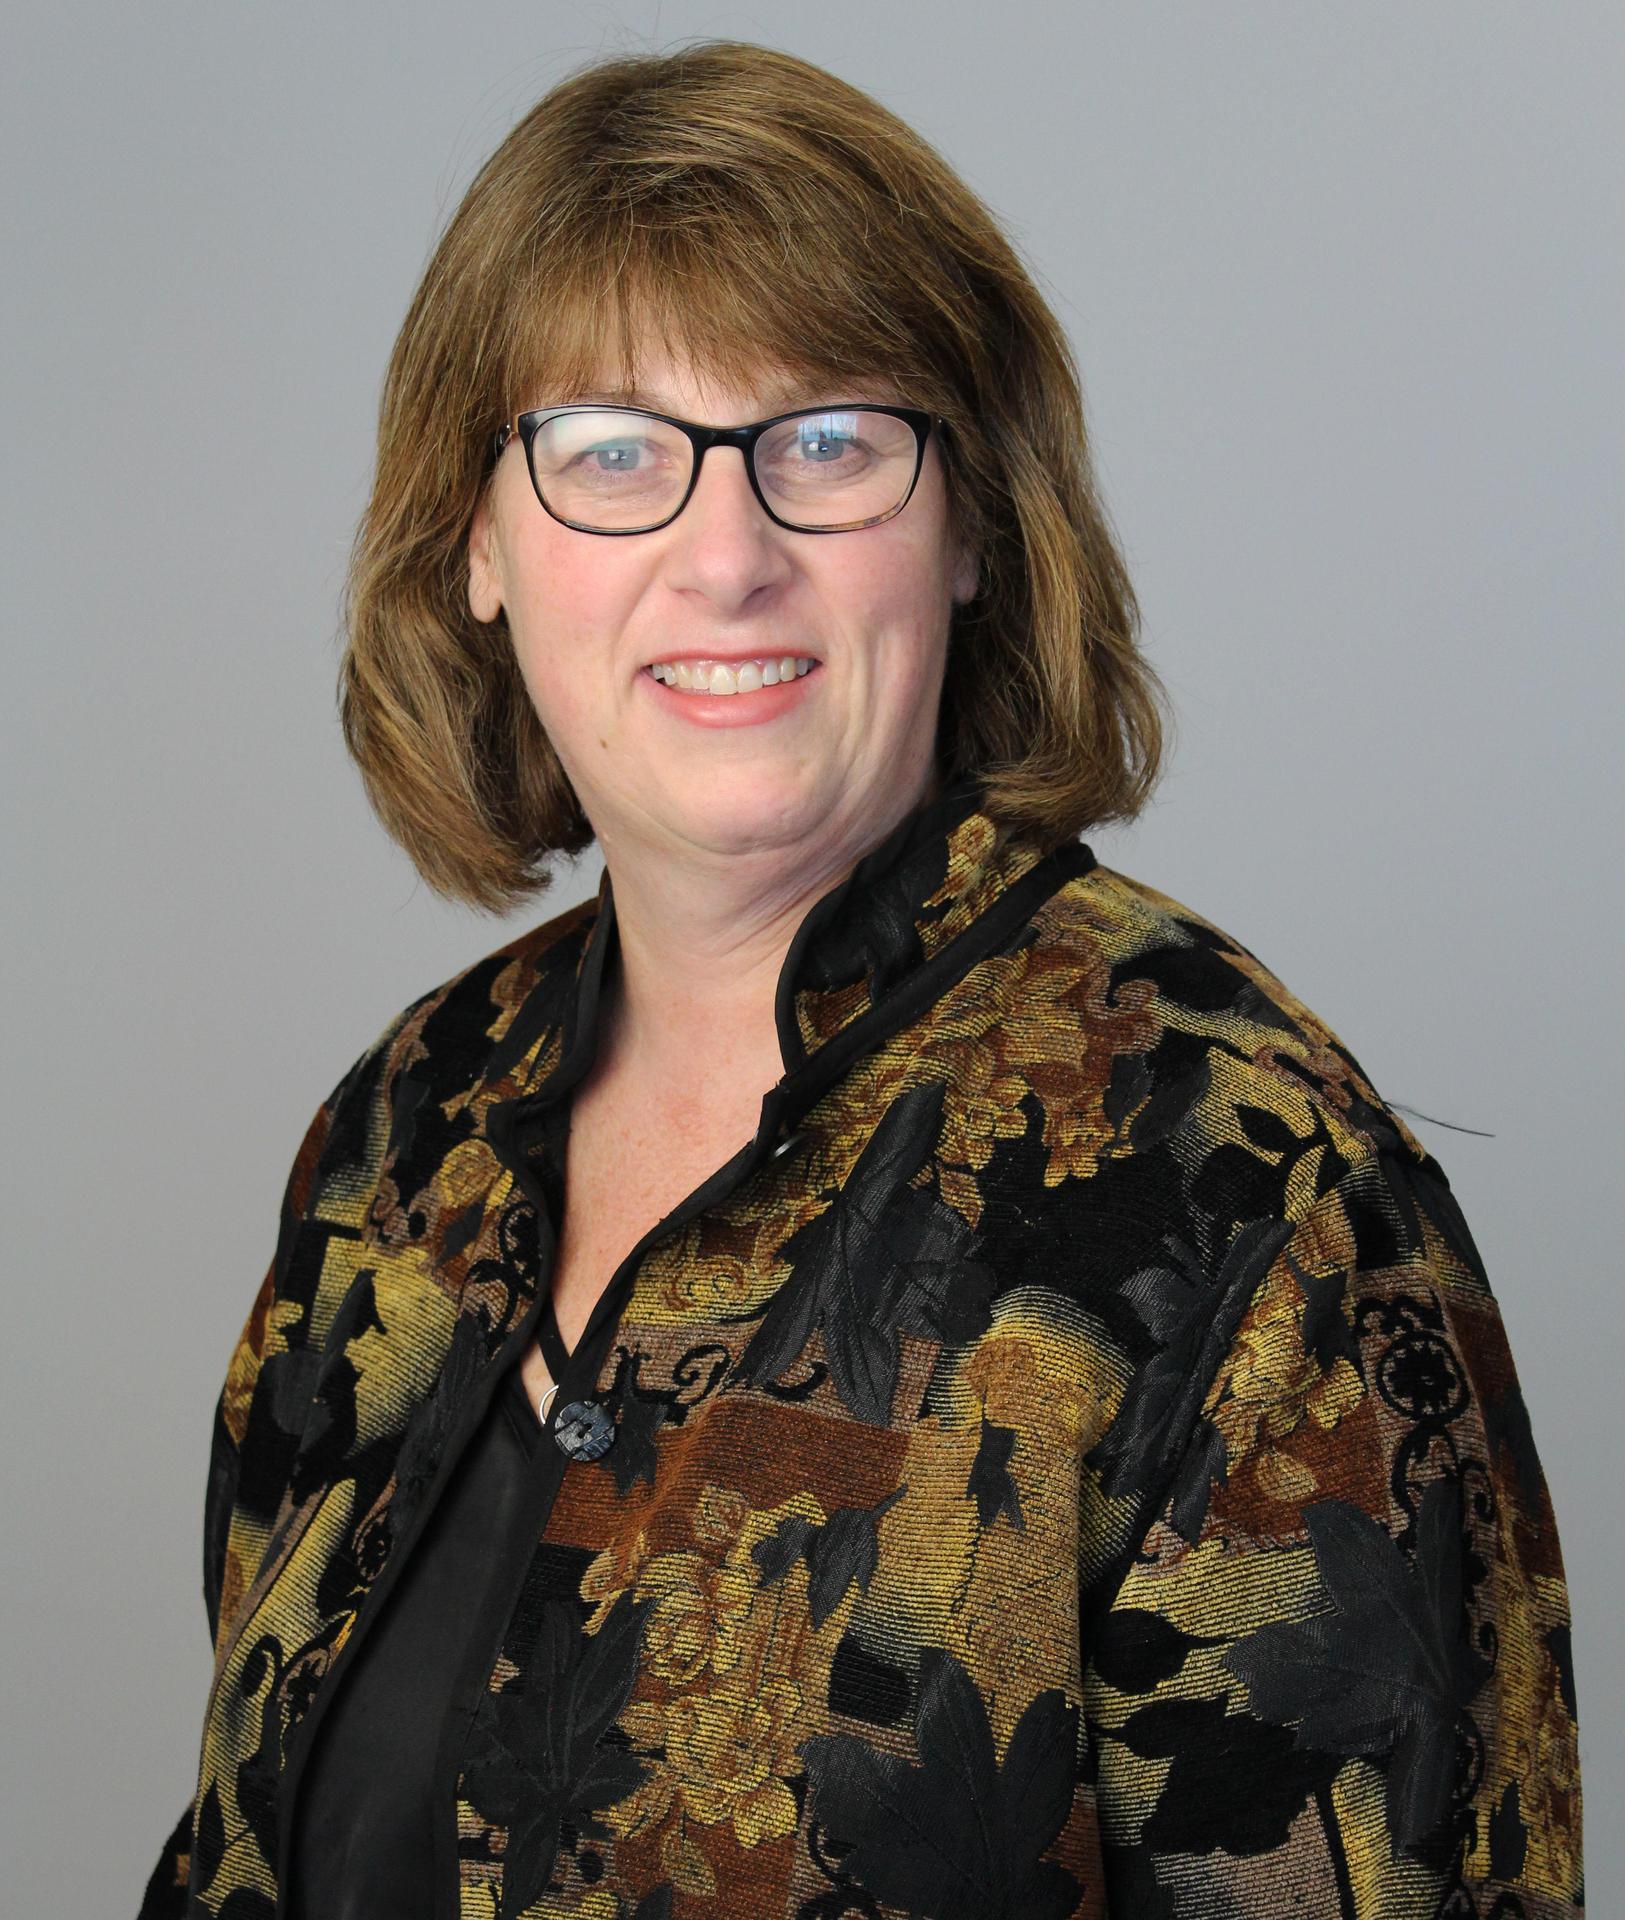 Headshot of Jane Morris